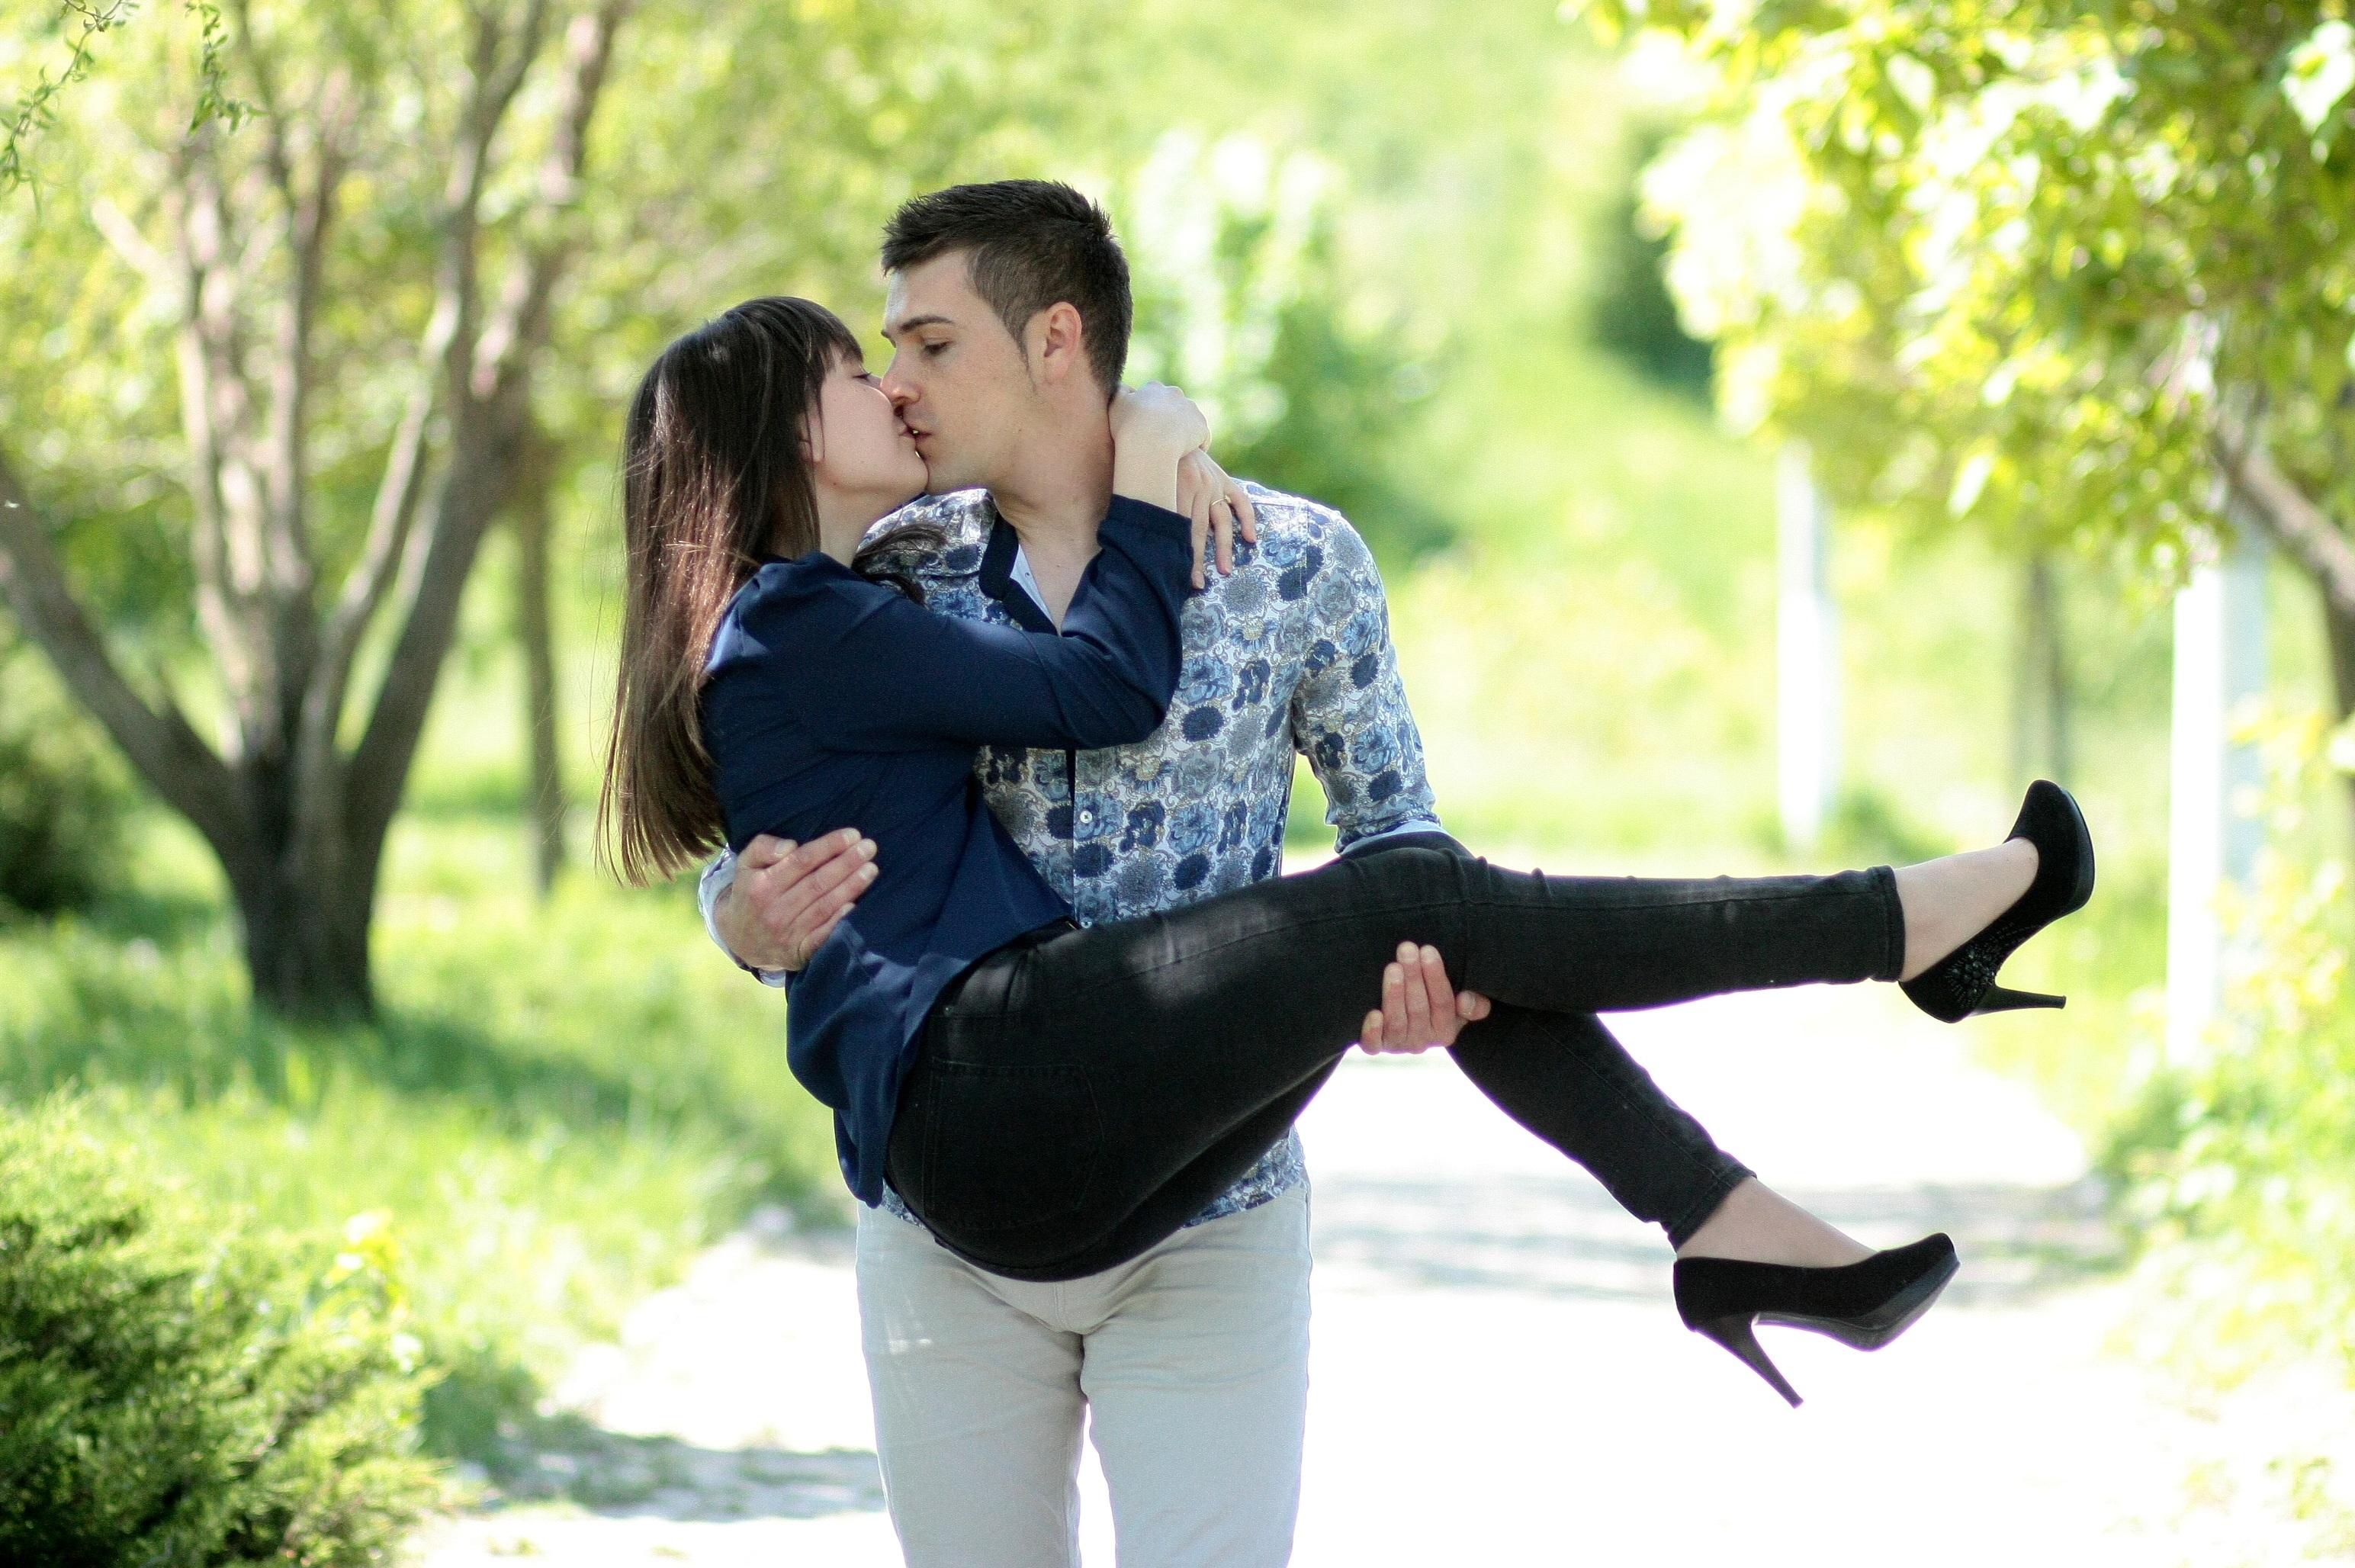 Картинка как девушка любит парня